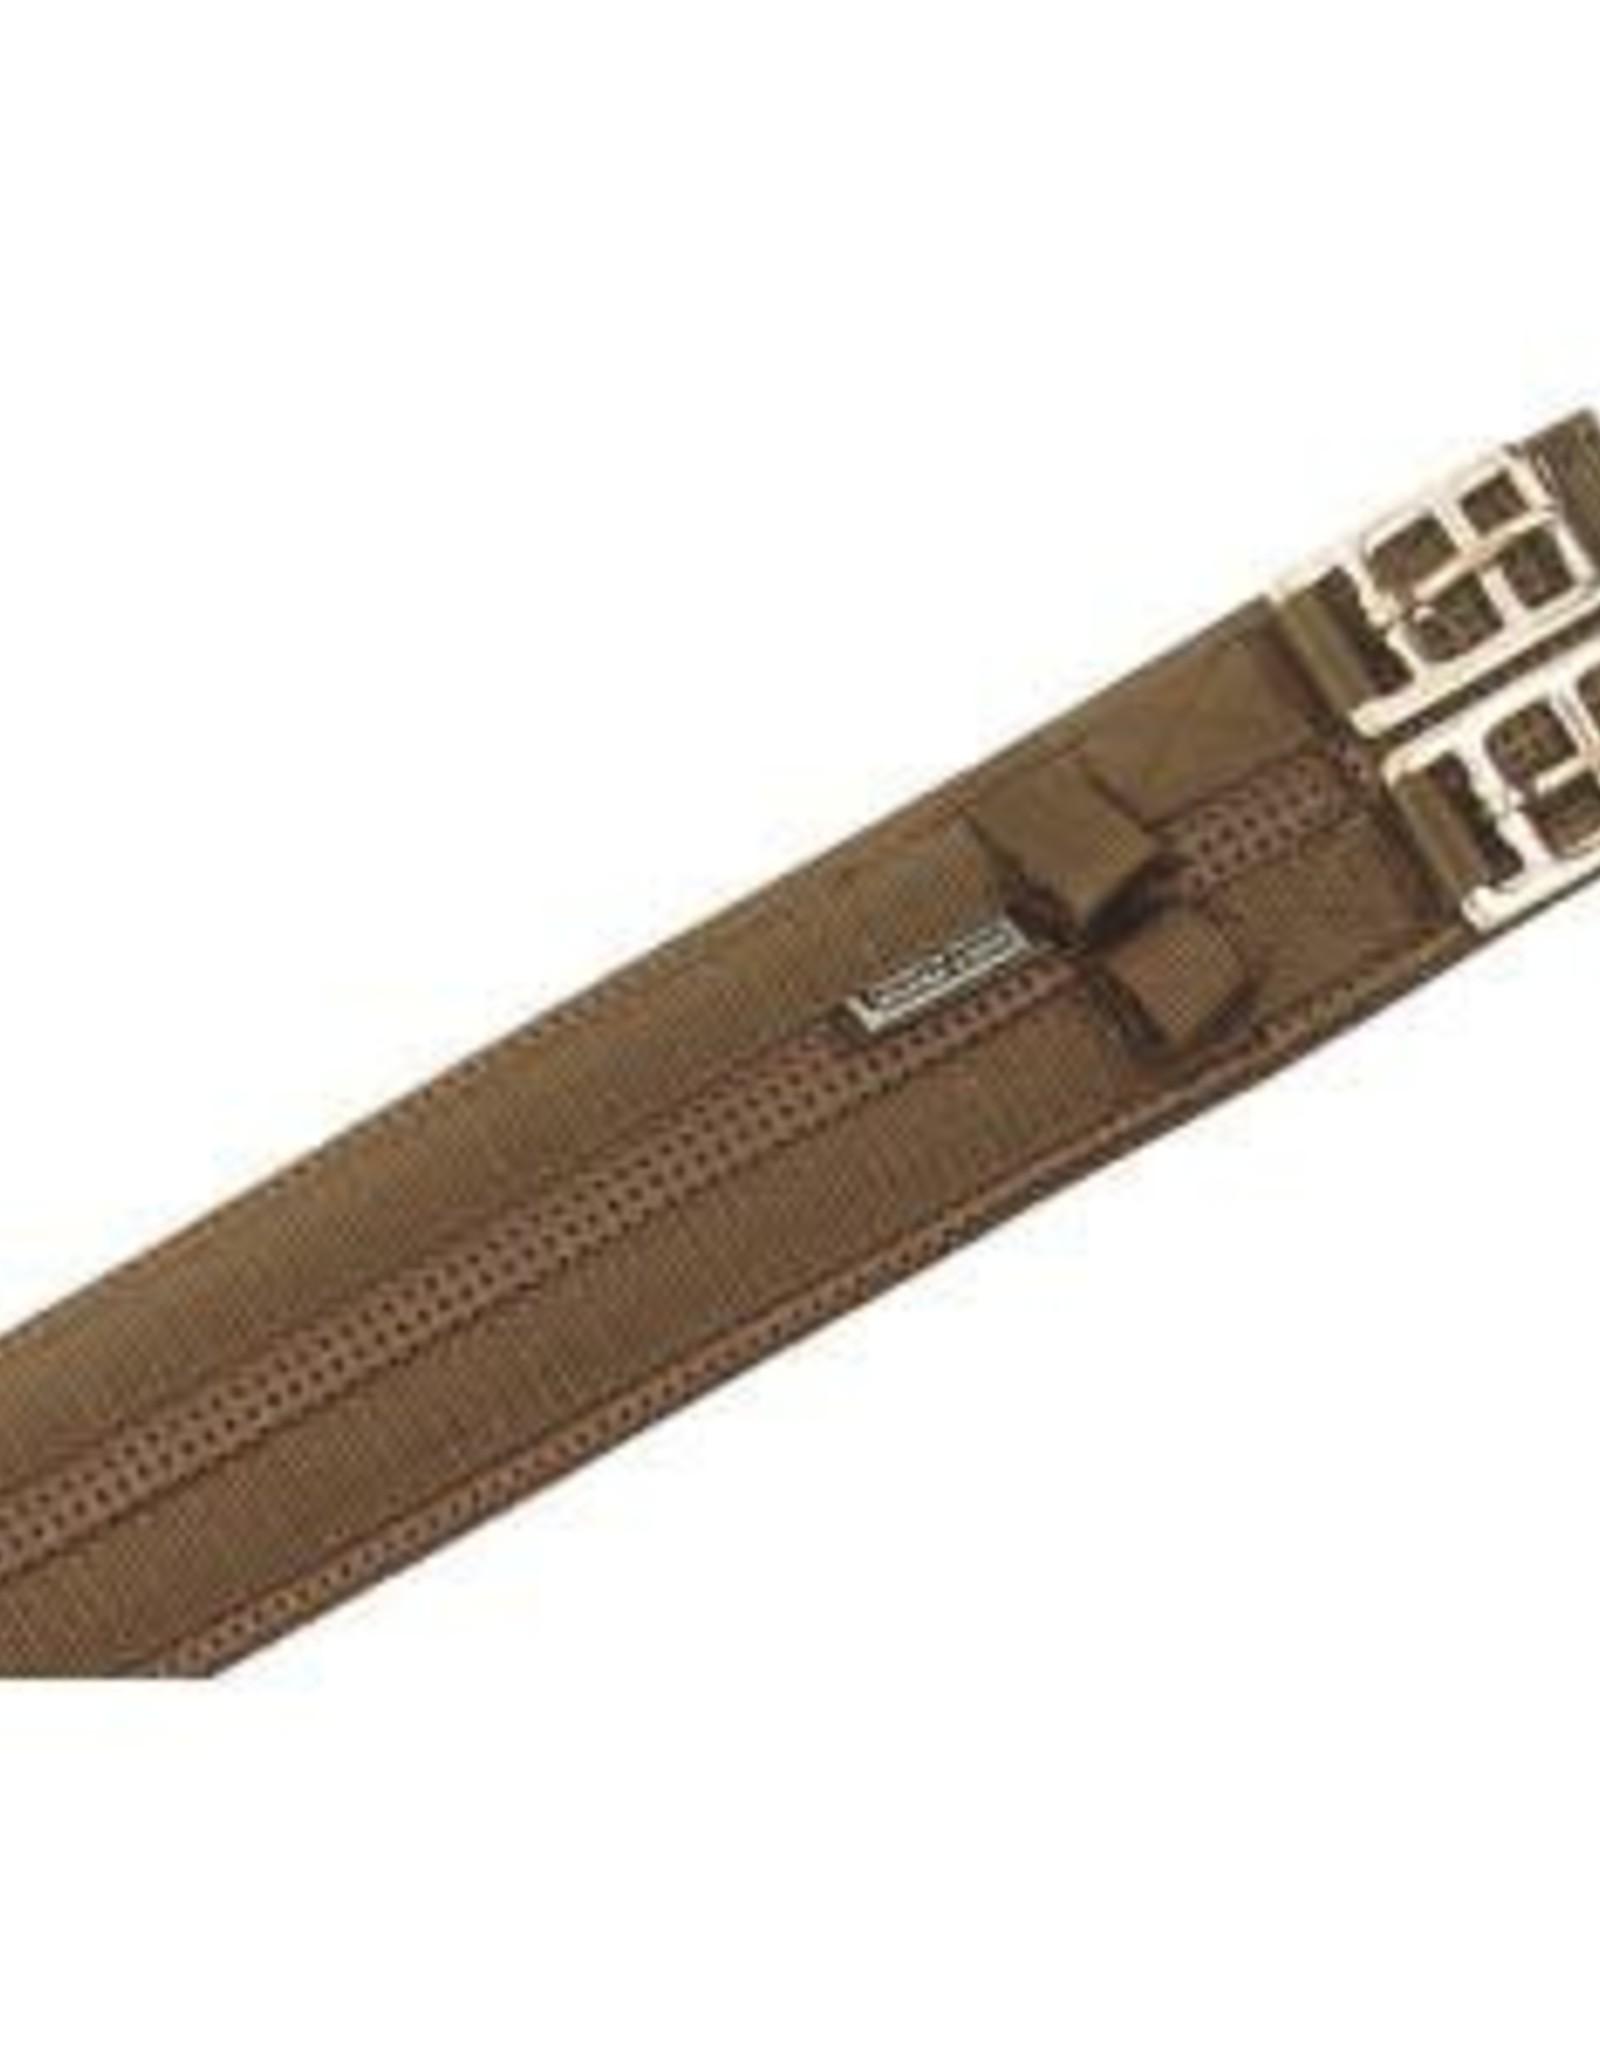 Equi-Prene Lonsdale Anti-Gall Girth - Brown - 60cm